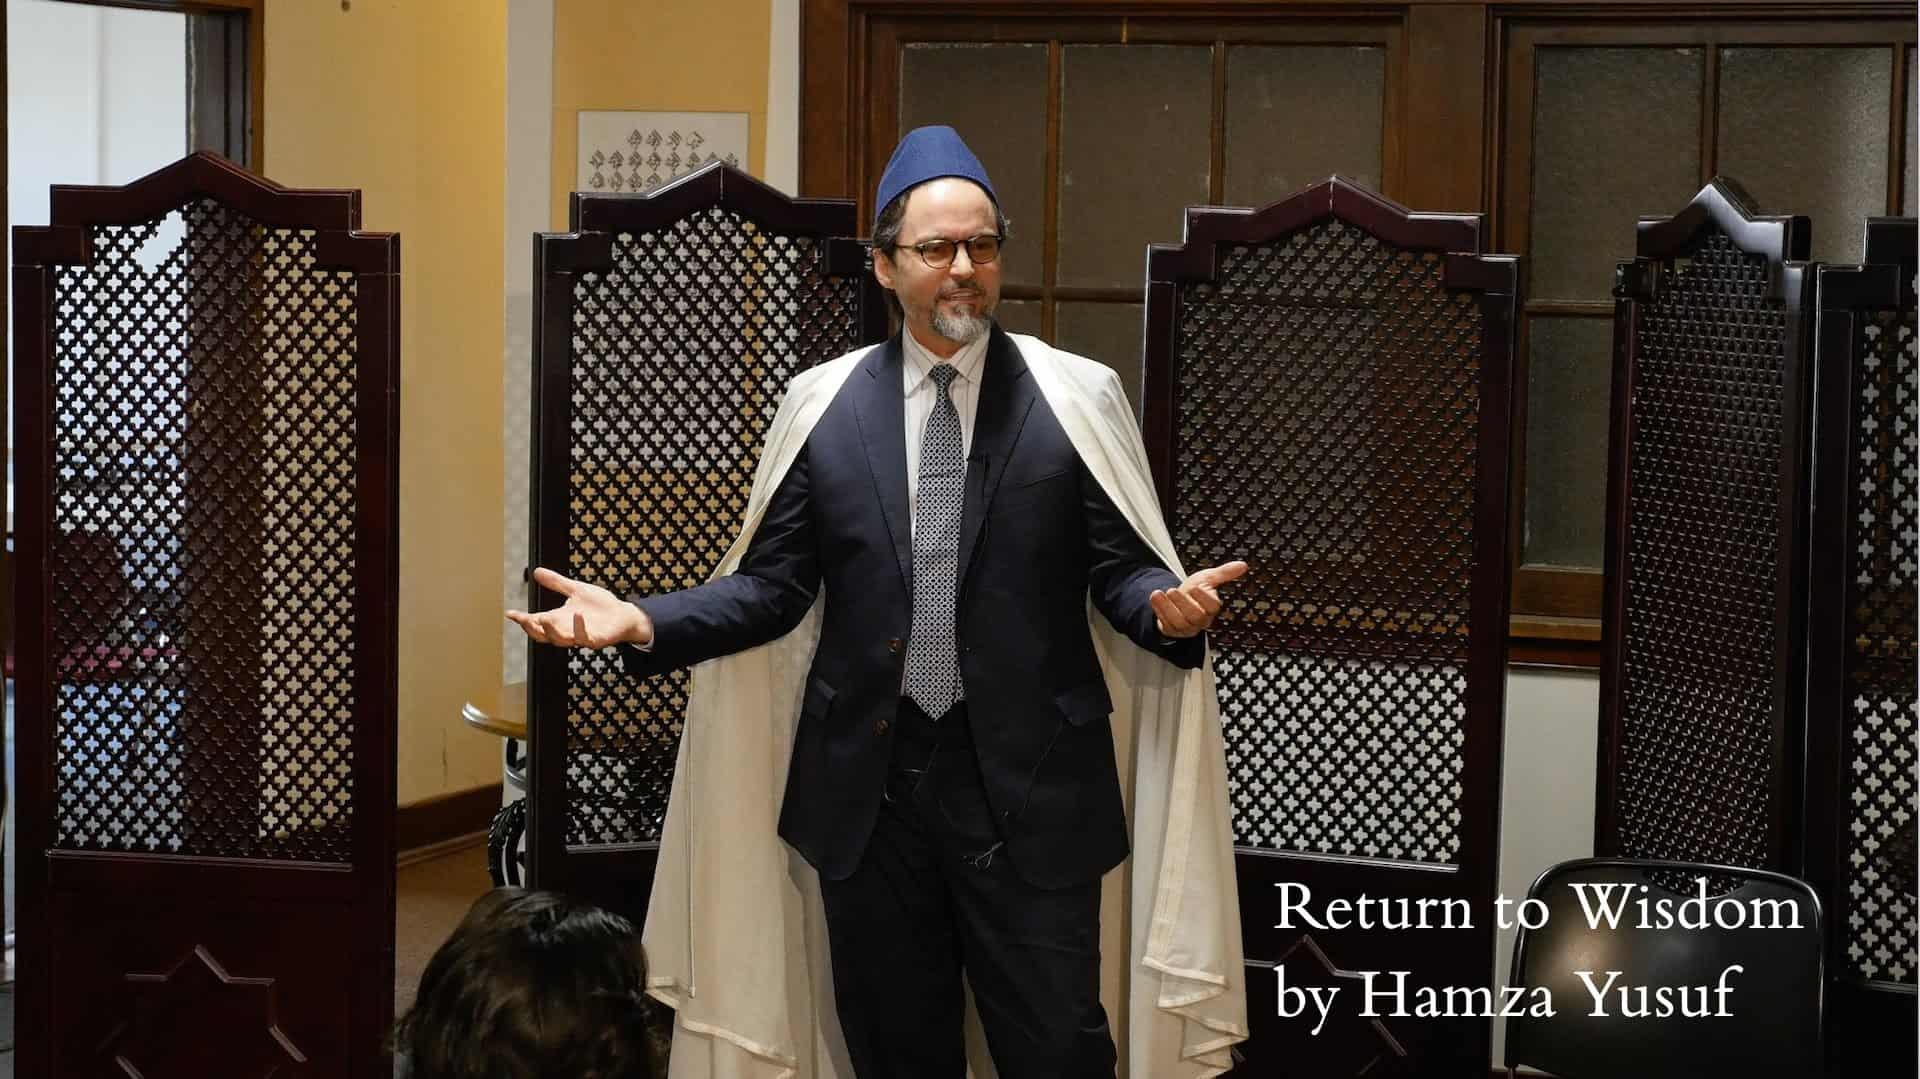 Hamza Yusuf – Return to Wisdom